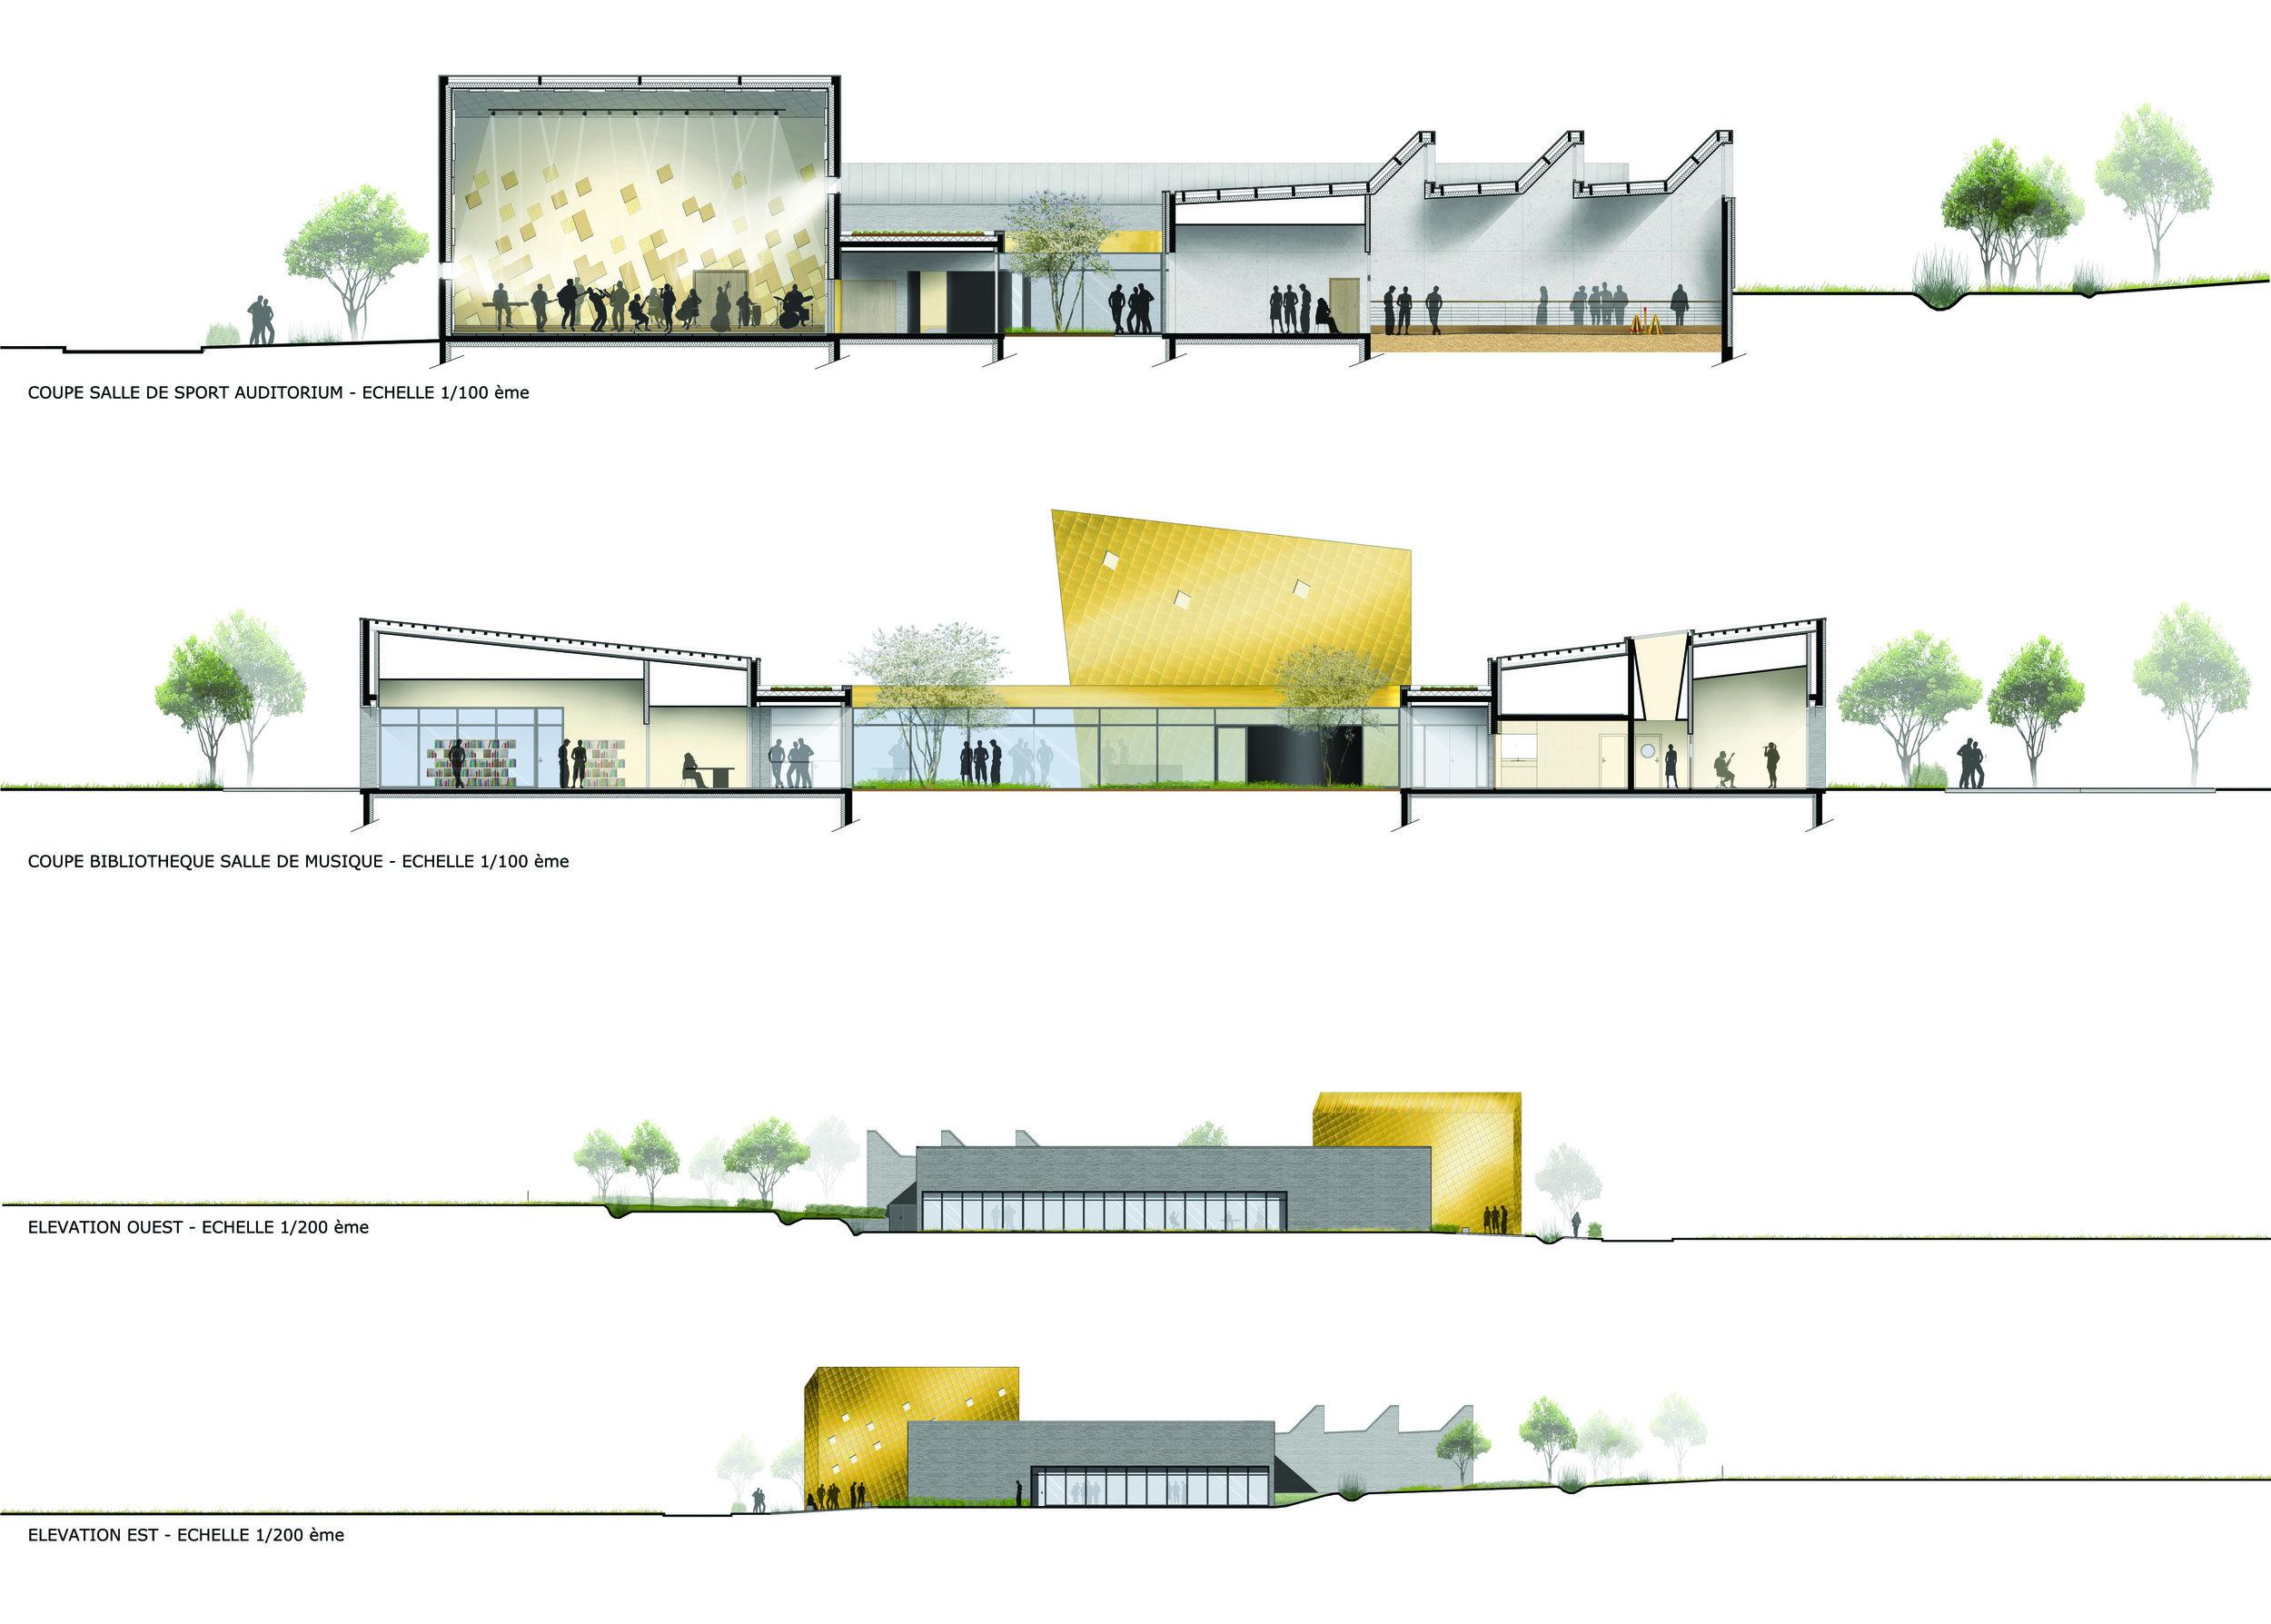 associations_culture_house_raimbeaucourt_public_outdoor_design_christophe_gautrand_landscape_3.jpg